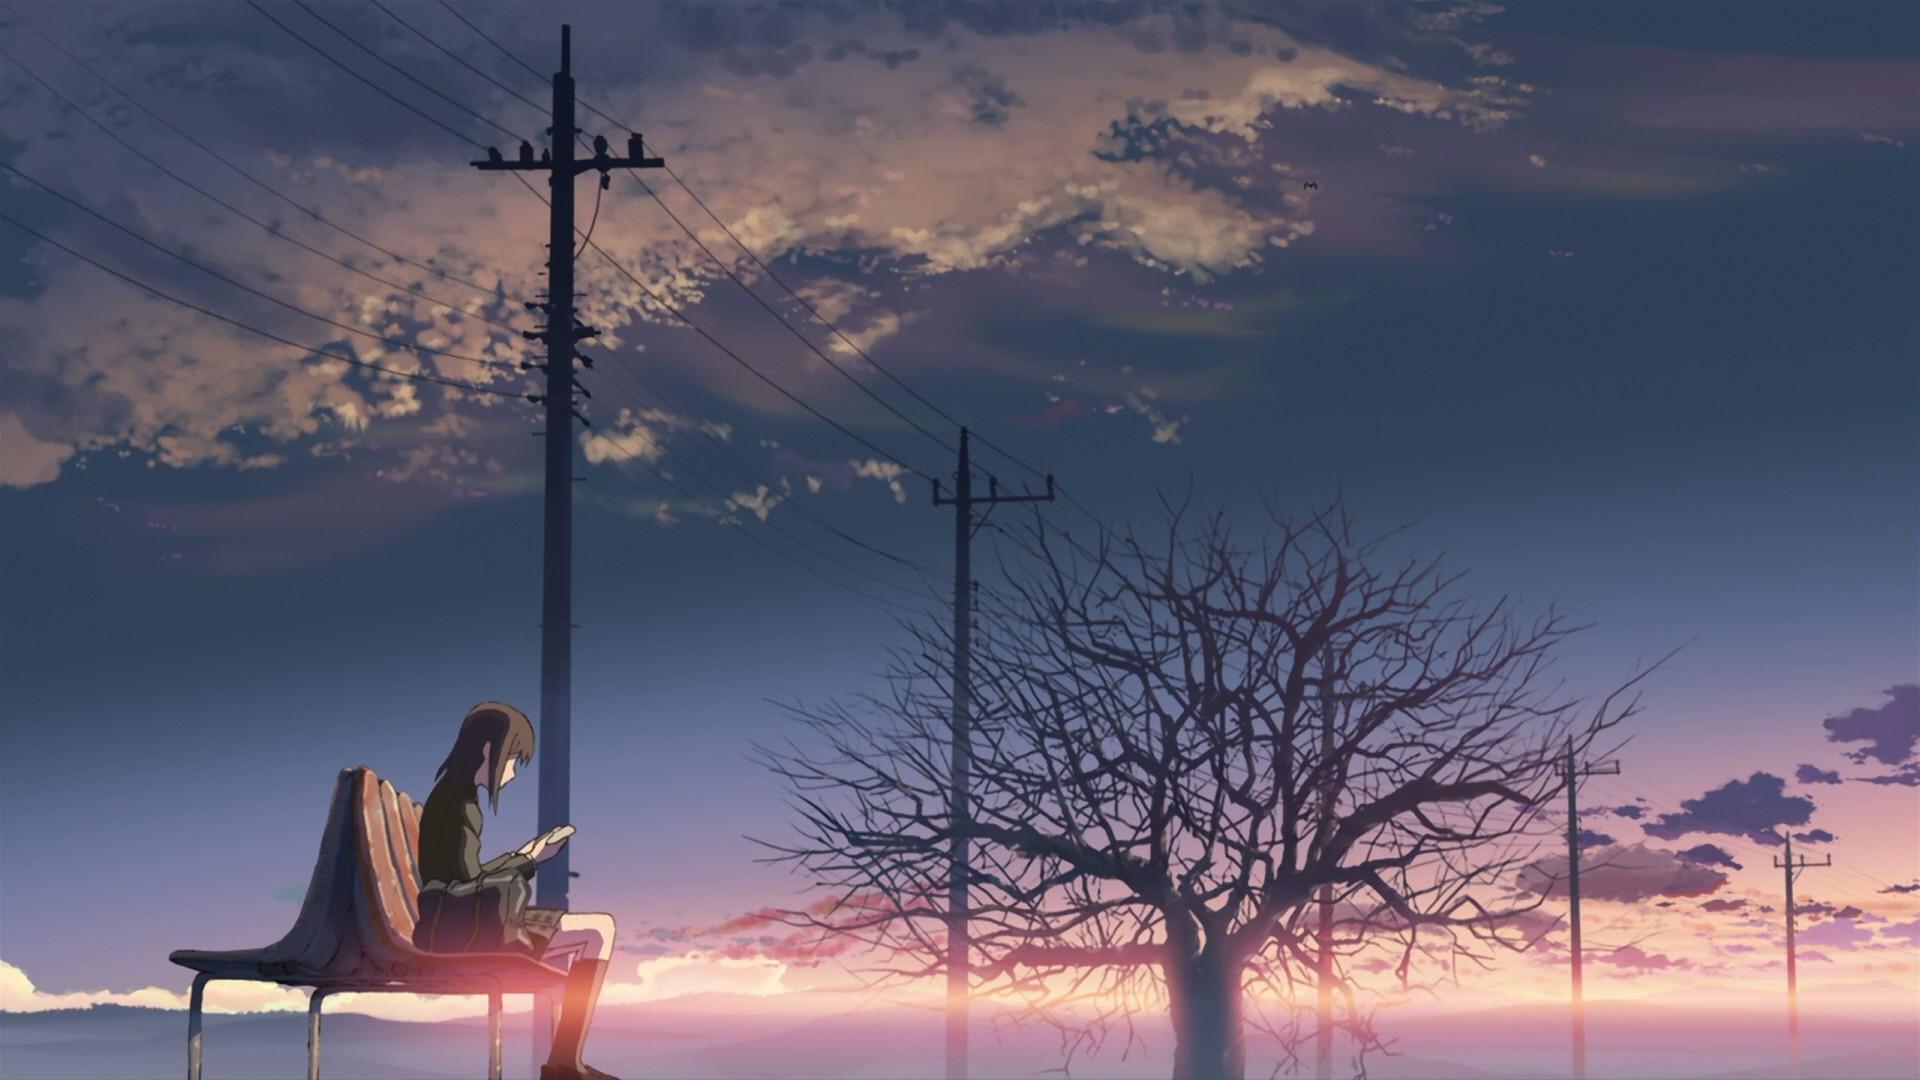 Anime 1920x1080 anime 5 Centimeters Per Second power lines trees sunlight bench bag anime girls brunette cellphone clouds sunrise